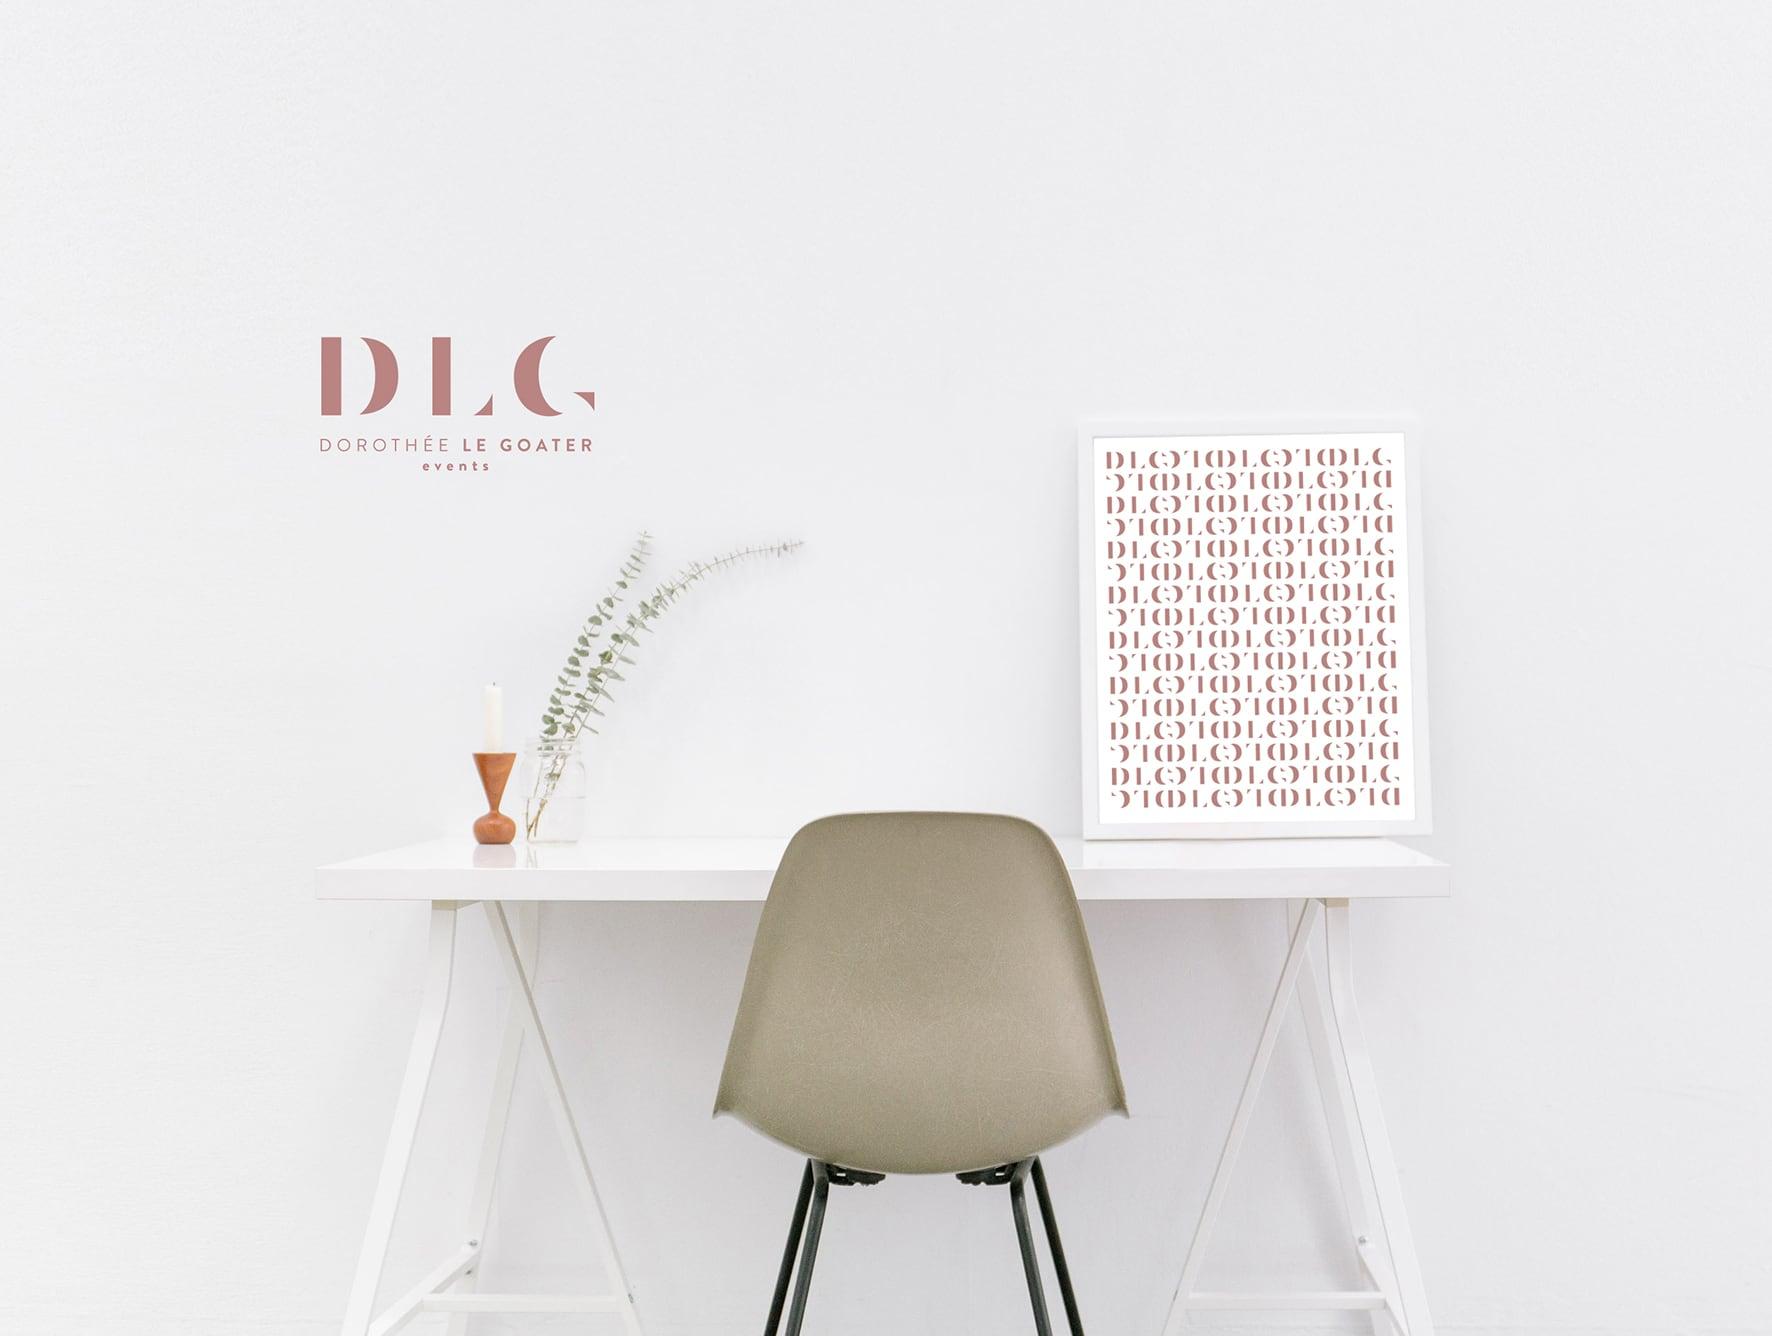 Bureau_DLG